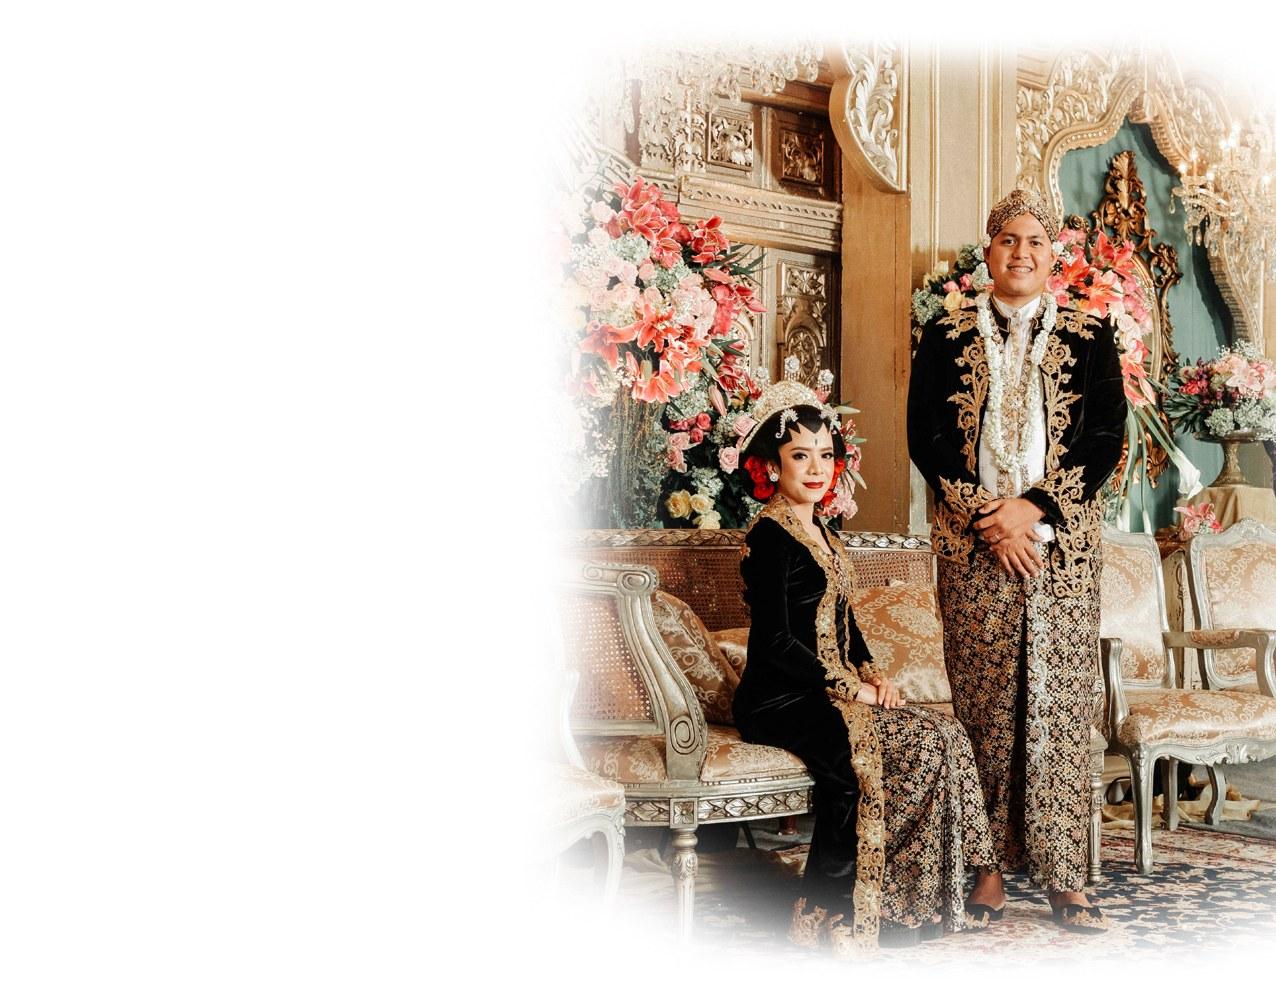 Design Baju Pengantin Muslimah 2017 Txdf Ikk Indonesia